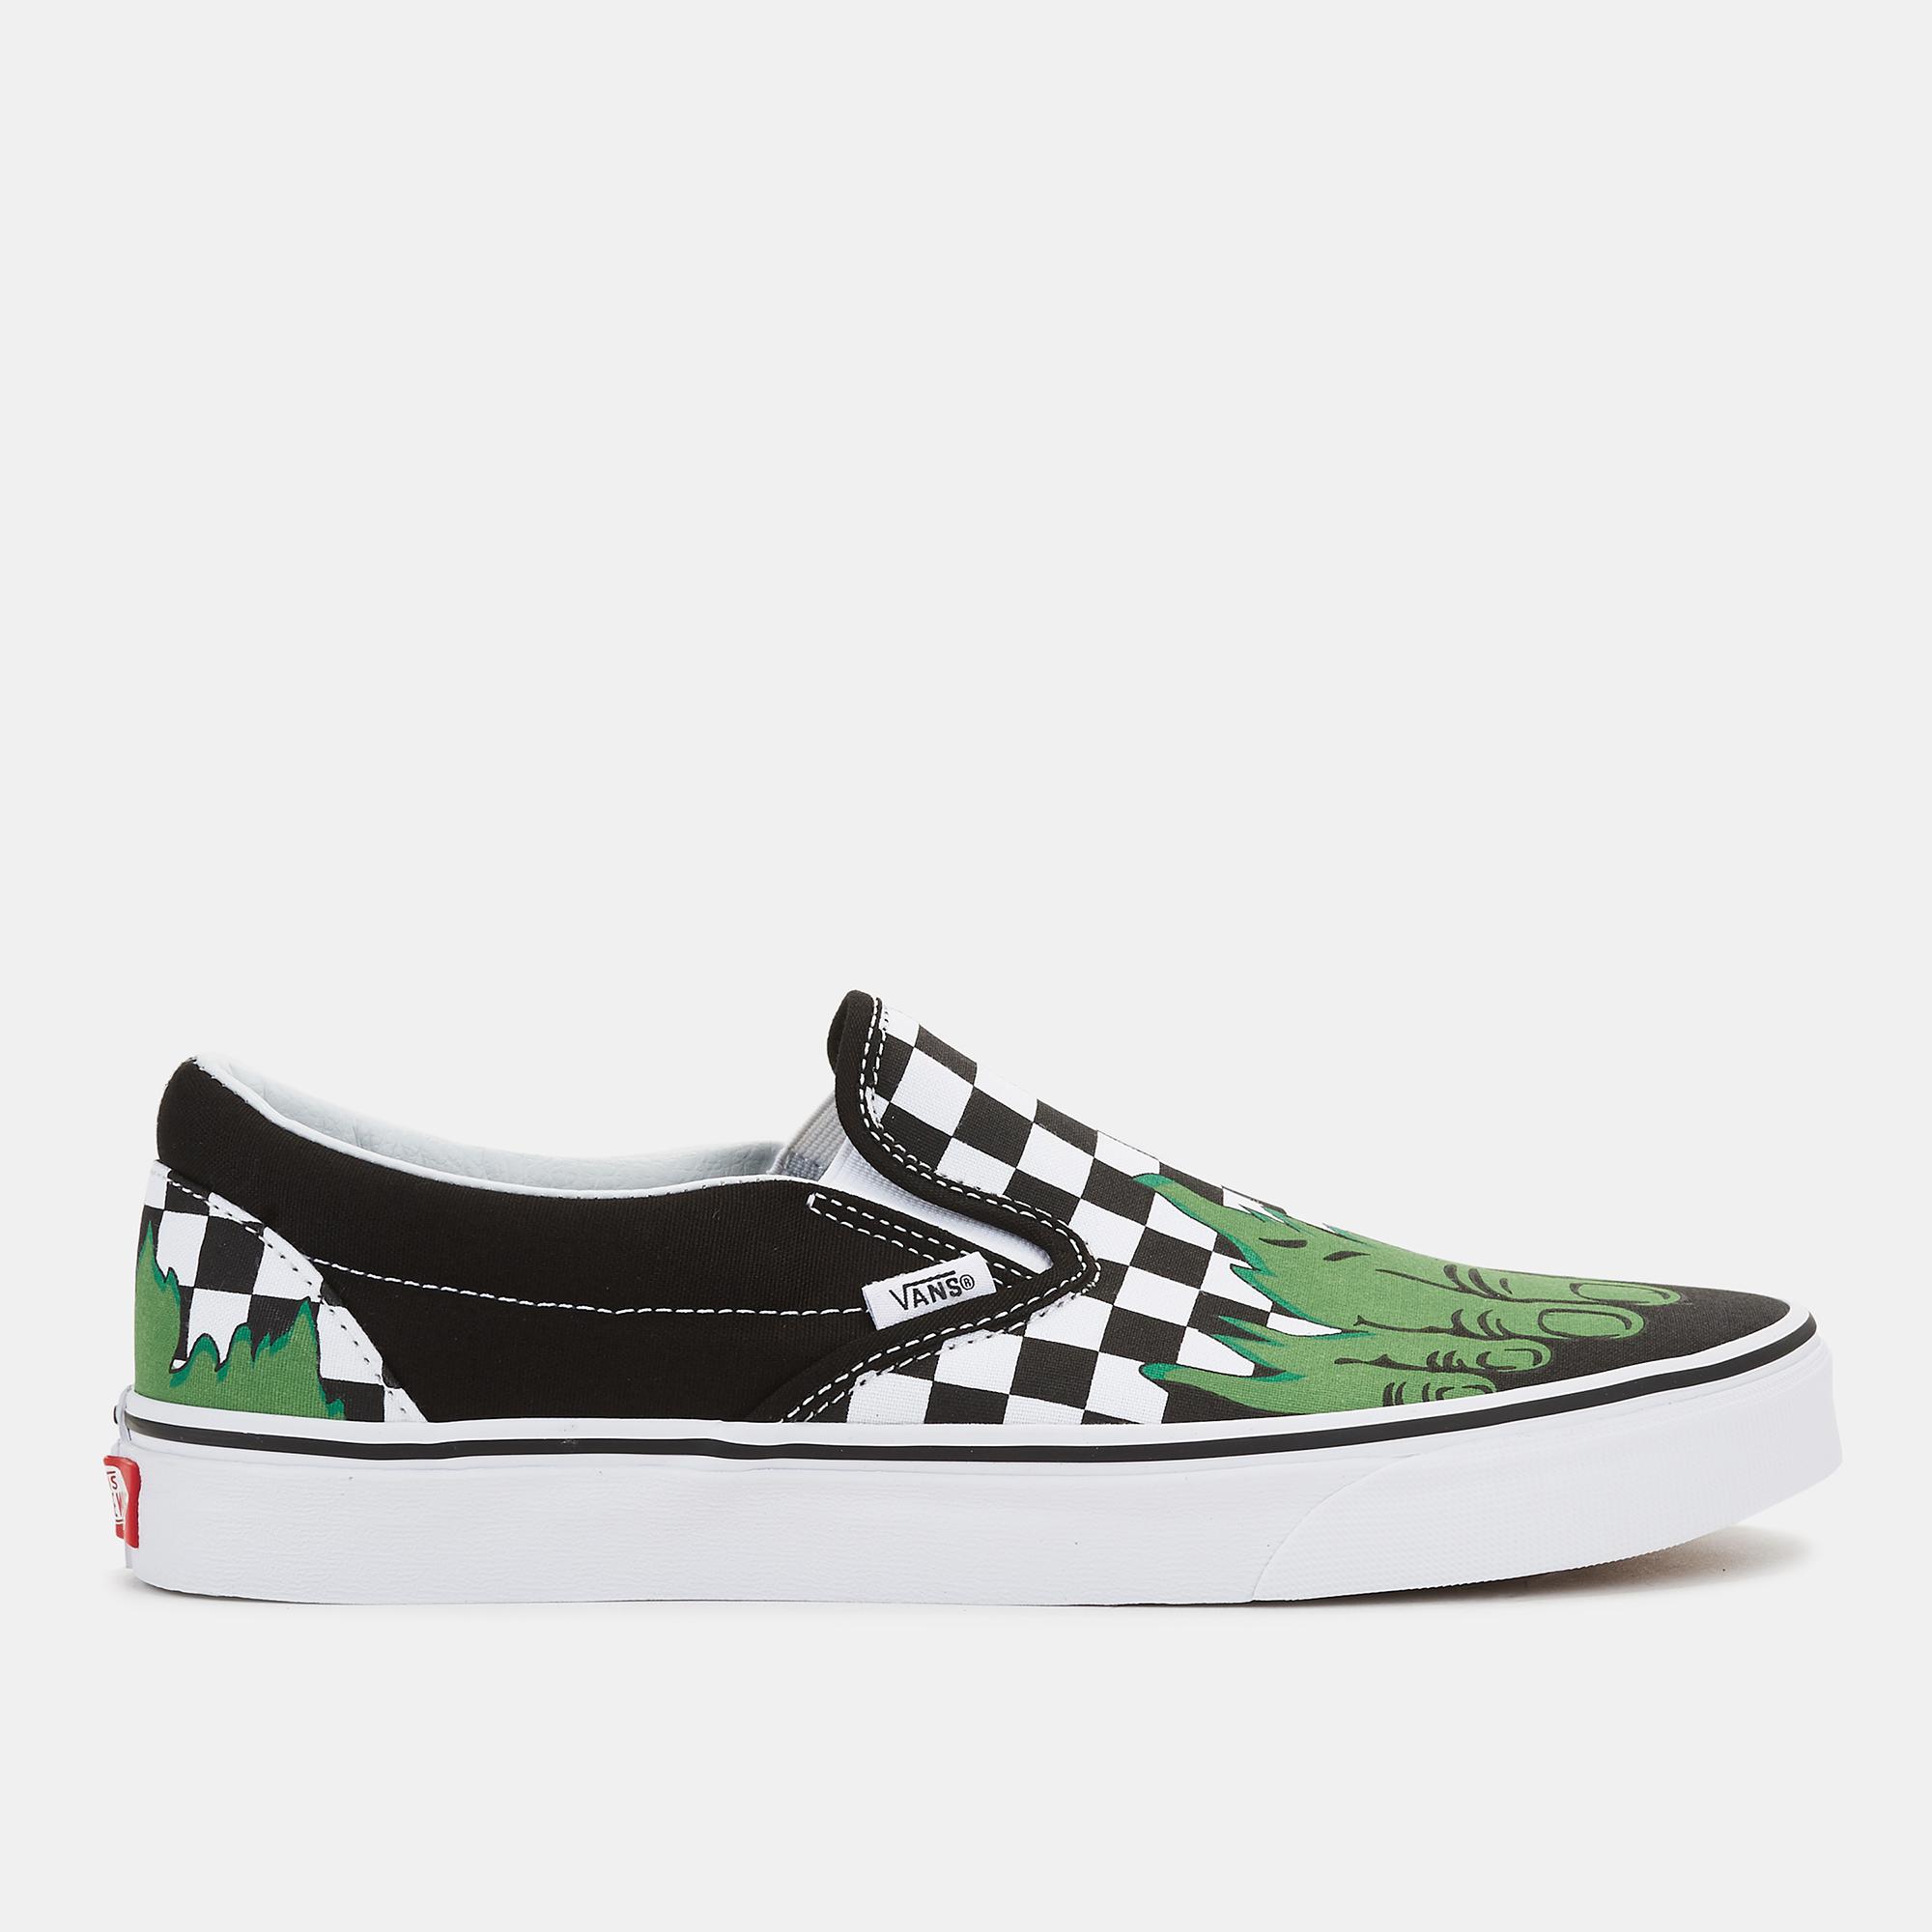 61325b9ff720de Vans x Marvel Classic Slip-On Shoe